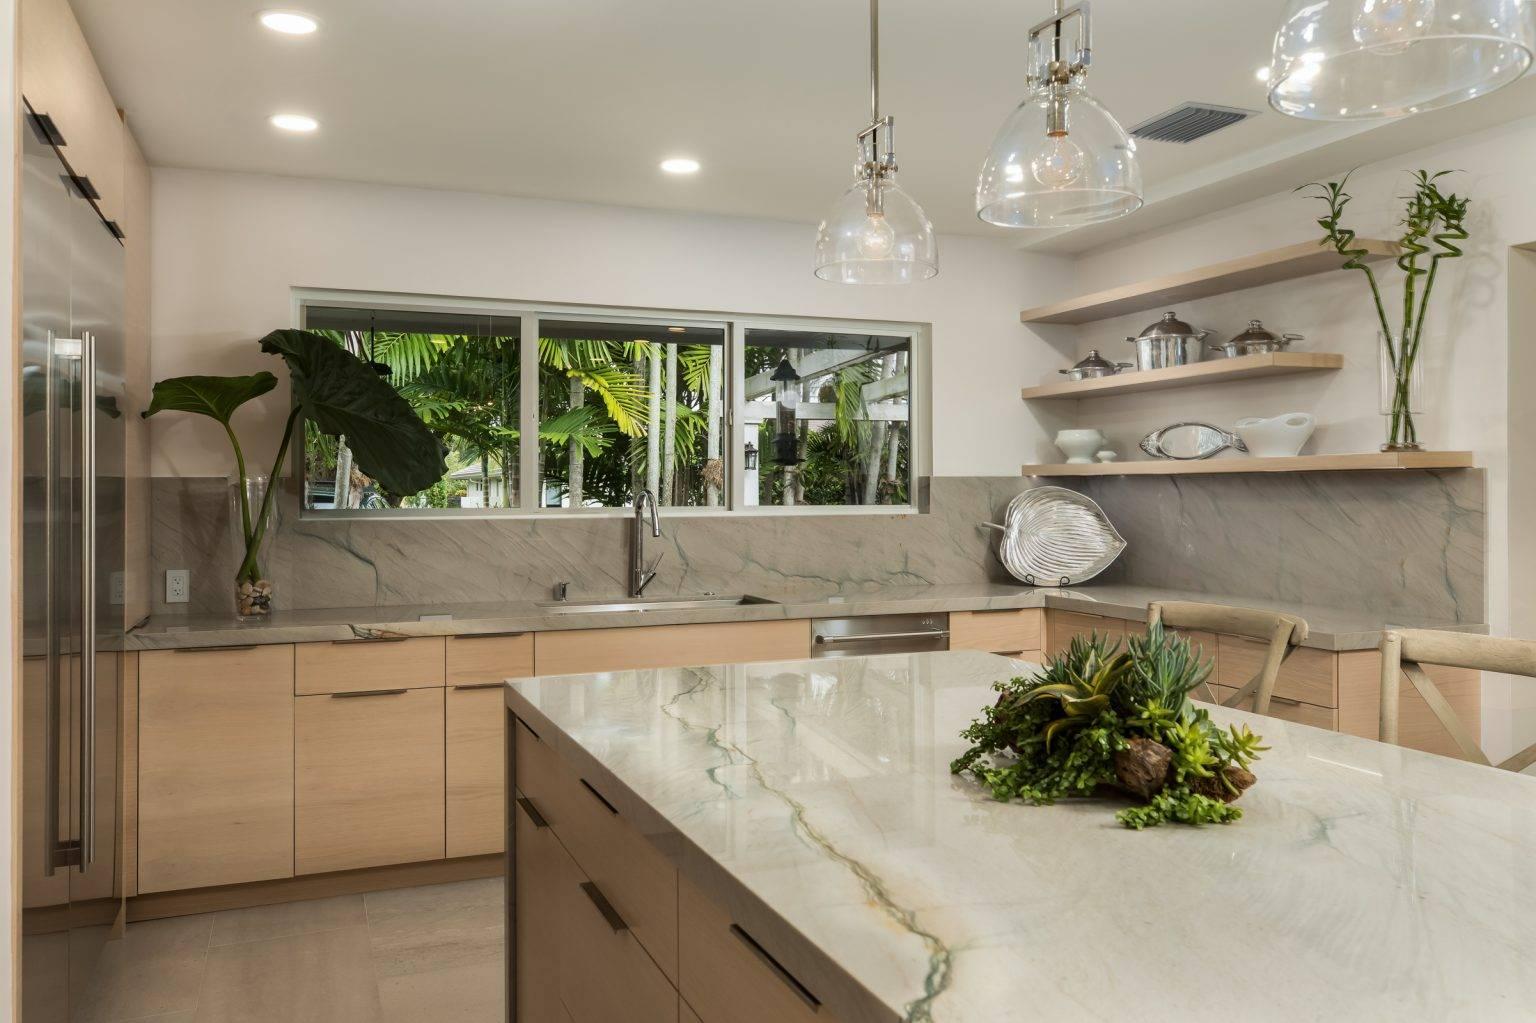 Florida Quartzite Kitchen 4 1536x1023, Primestones® Granite, Quartz, Marble